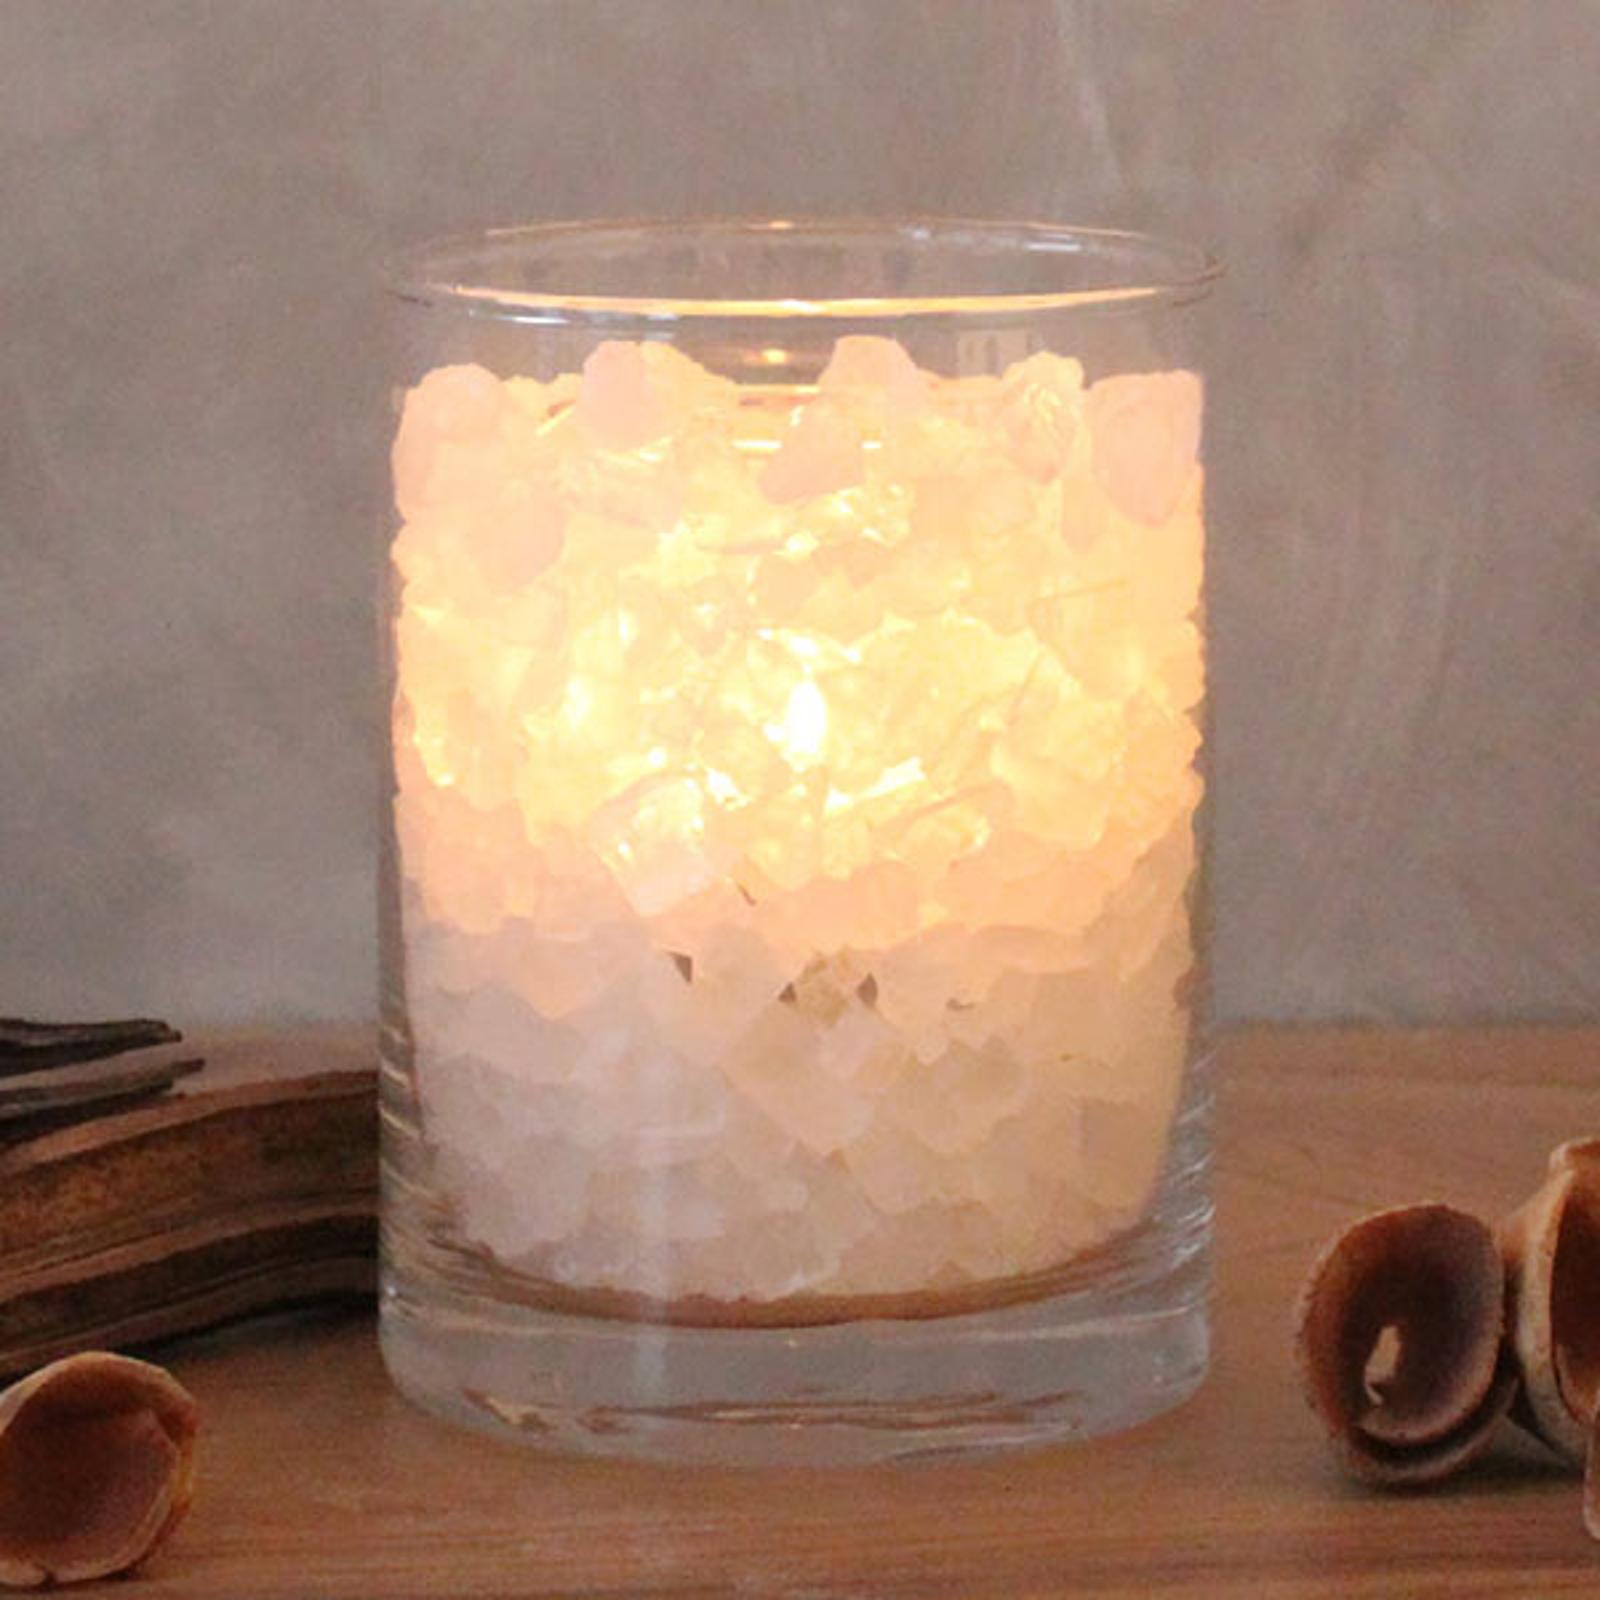 Polarild i glas, saltkrystal, med palmestearinlys